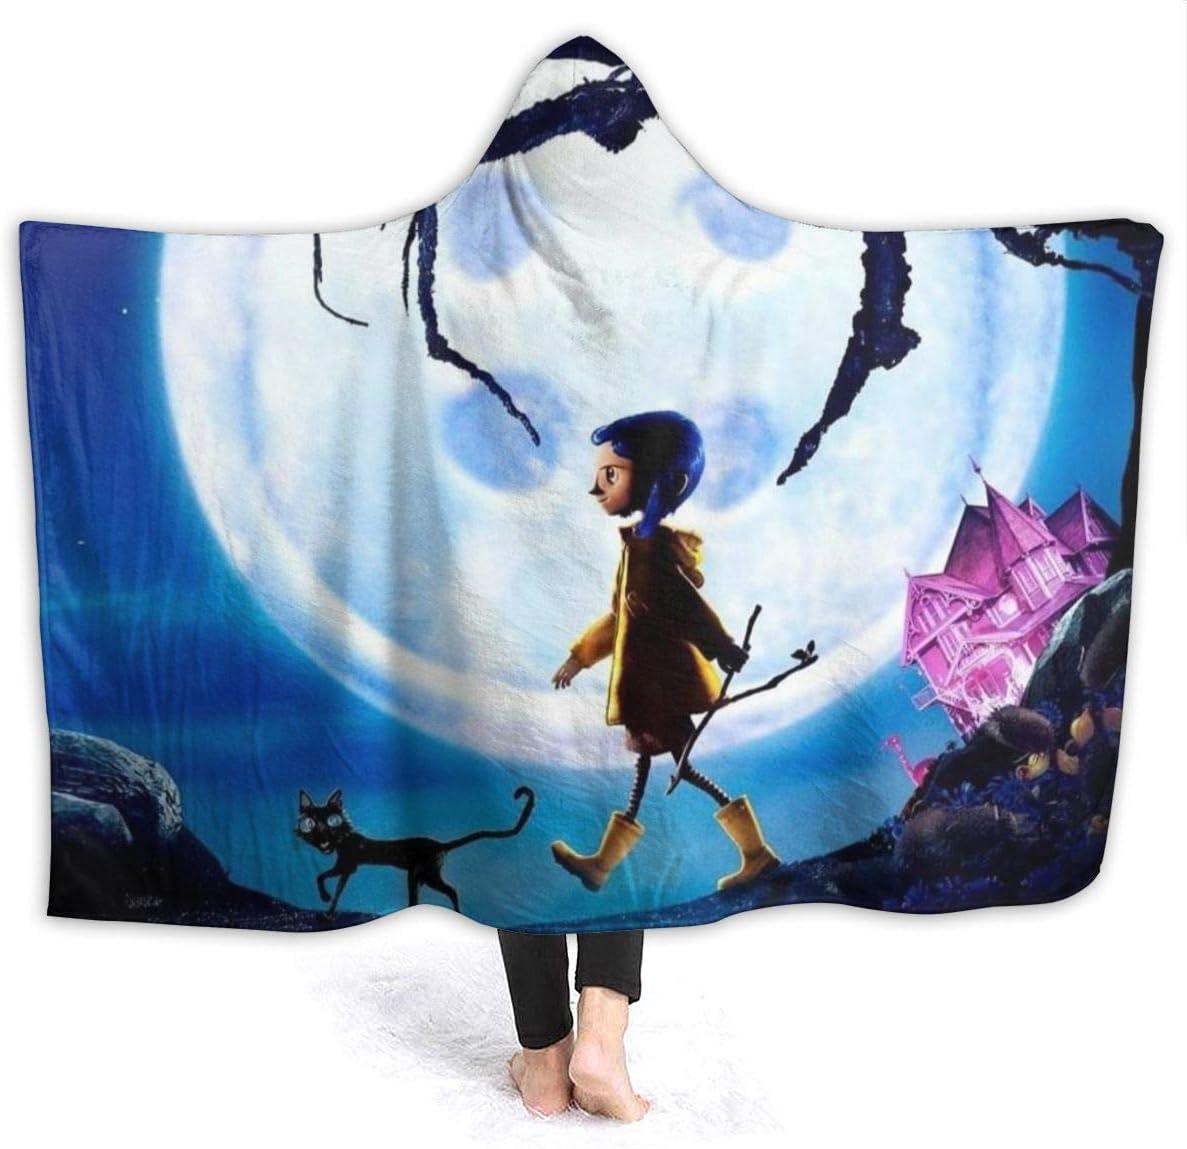 Coraline It is very popular Hooded Blanket for Classic Fleece Wearable Throw Adult